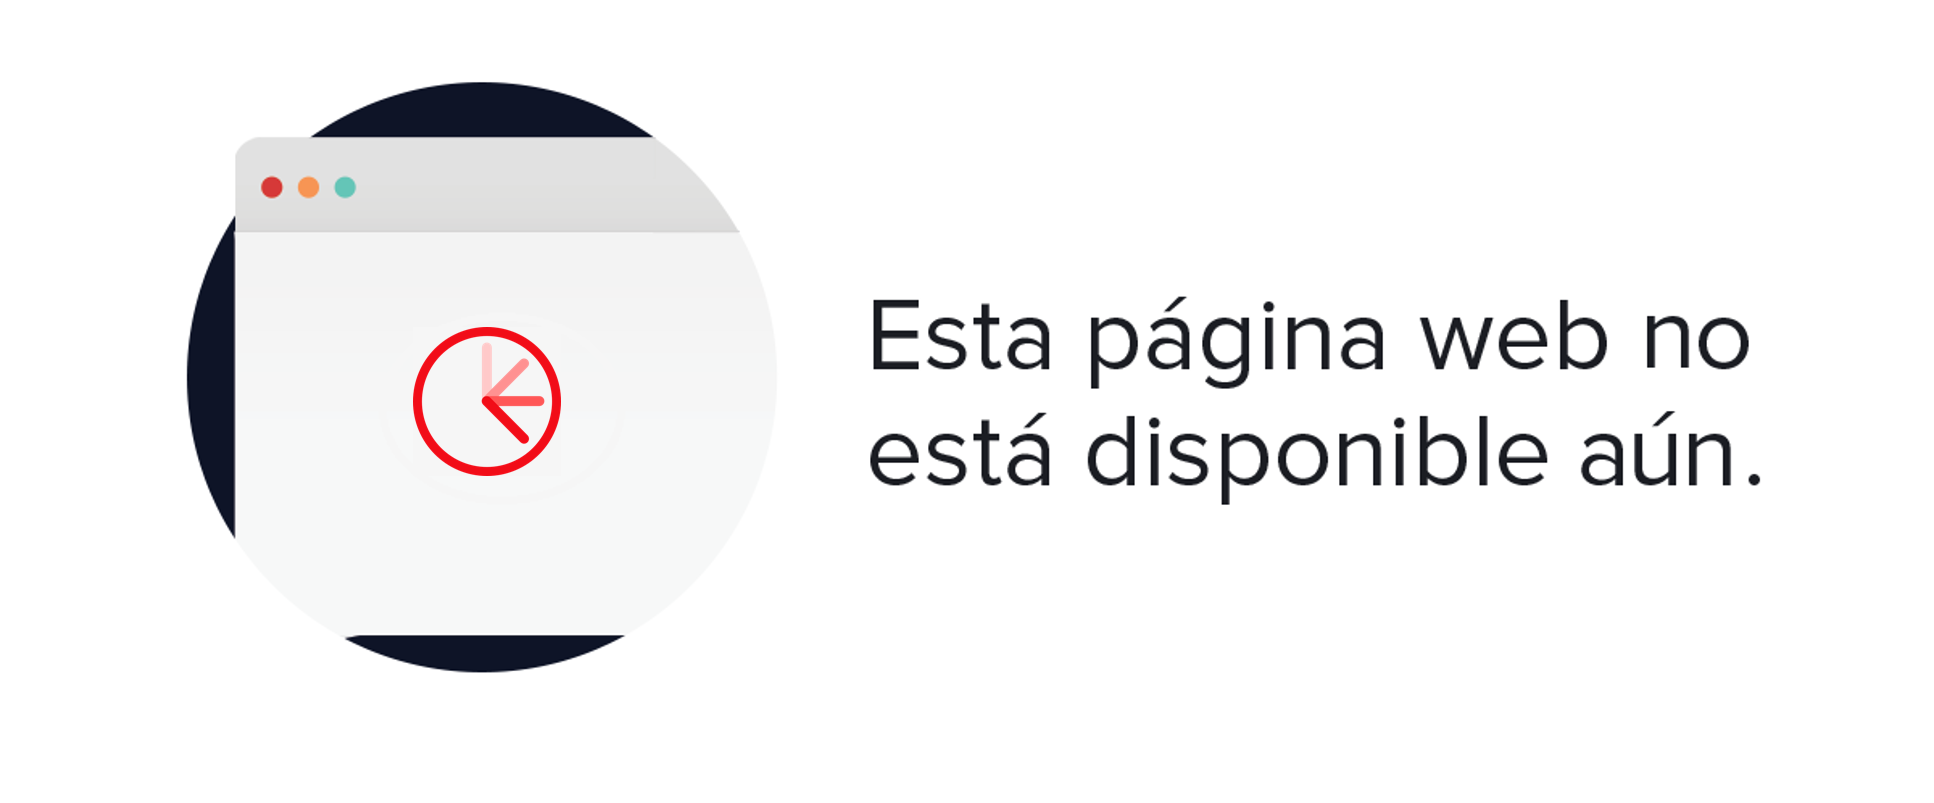 1f35bde8dc Fiesta El Corte Inglés - Falda larga de mujer Fiesta El Corte Inglés con  rayas Multicolor 001005611100081038 - FZMOLSG